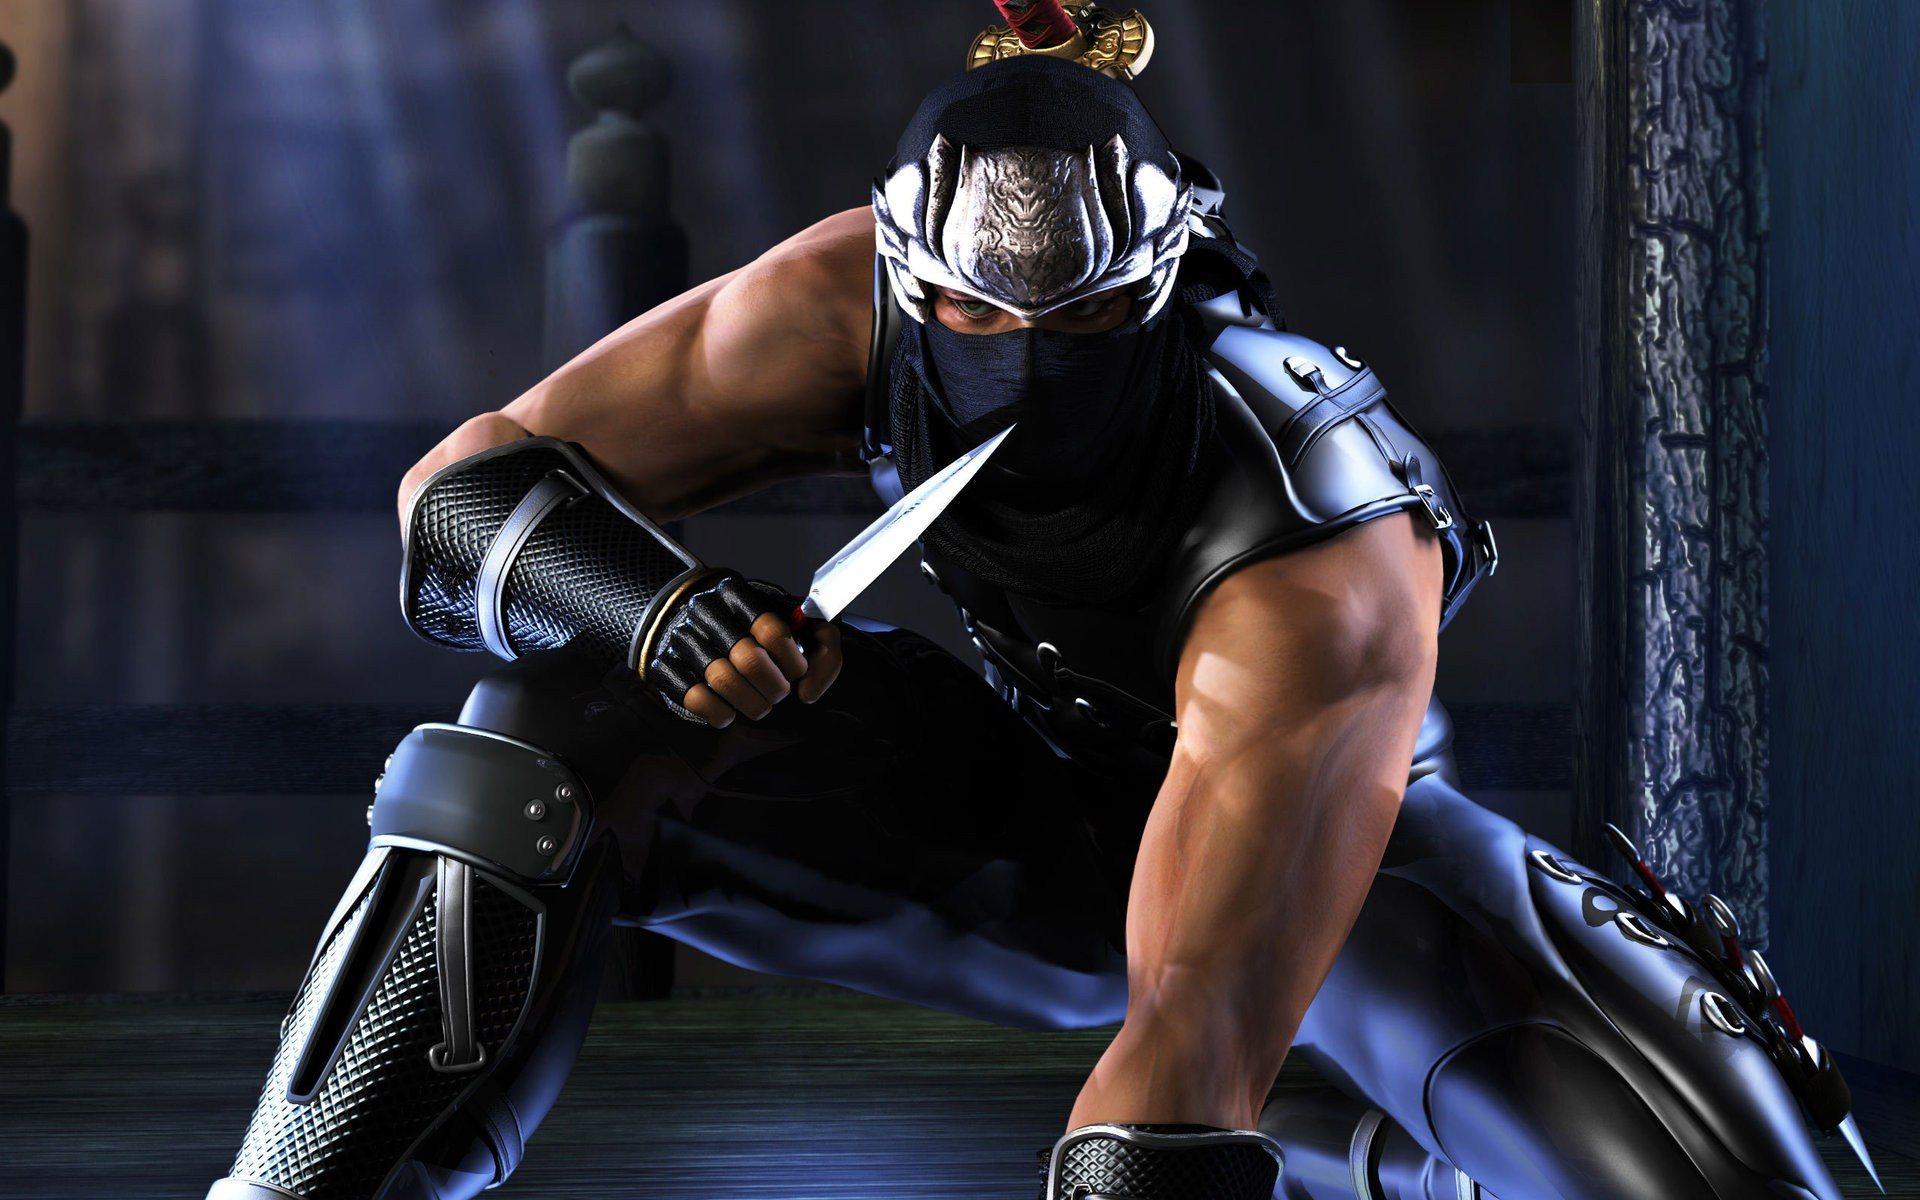 Ryu Hayabusa Ninja Gaiden Wallpapers